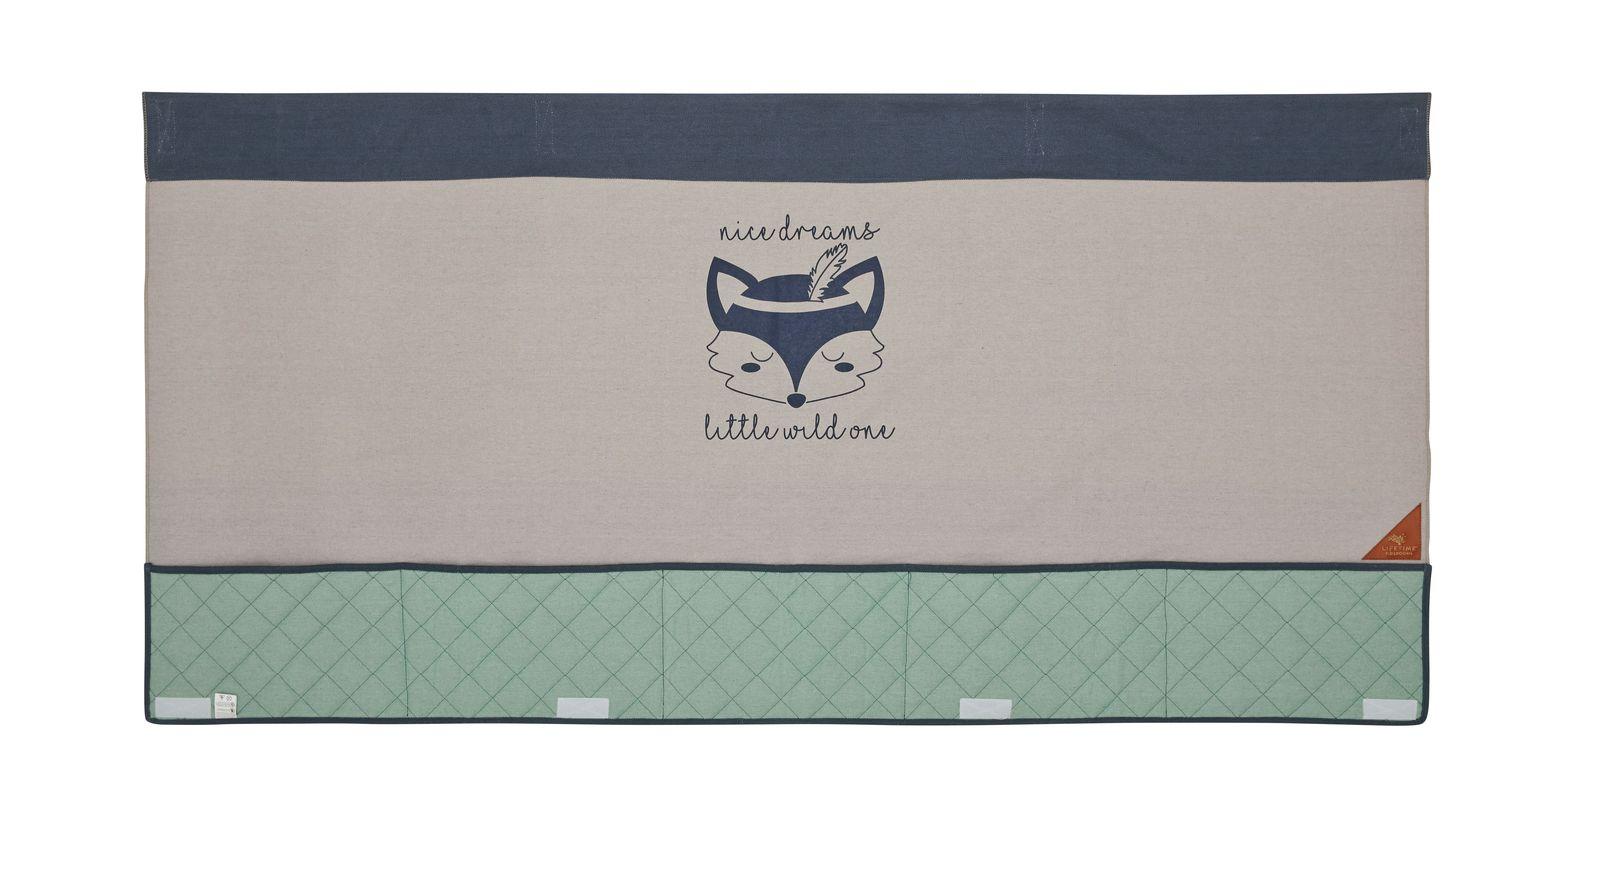 LIFETIME Kinderbett 4-in-1 Forest Ranger optional erhältliche Rückwand